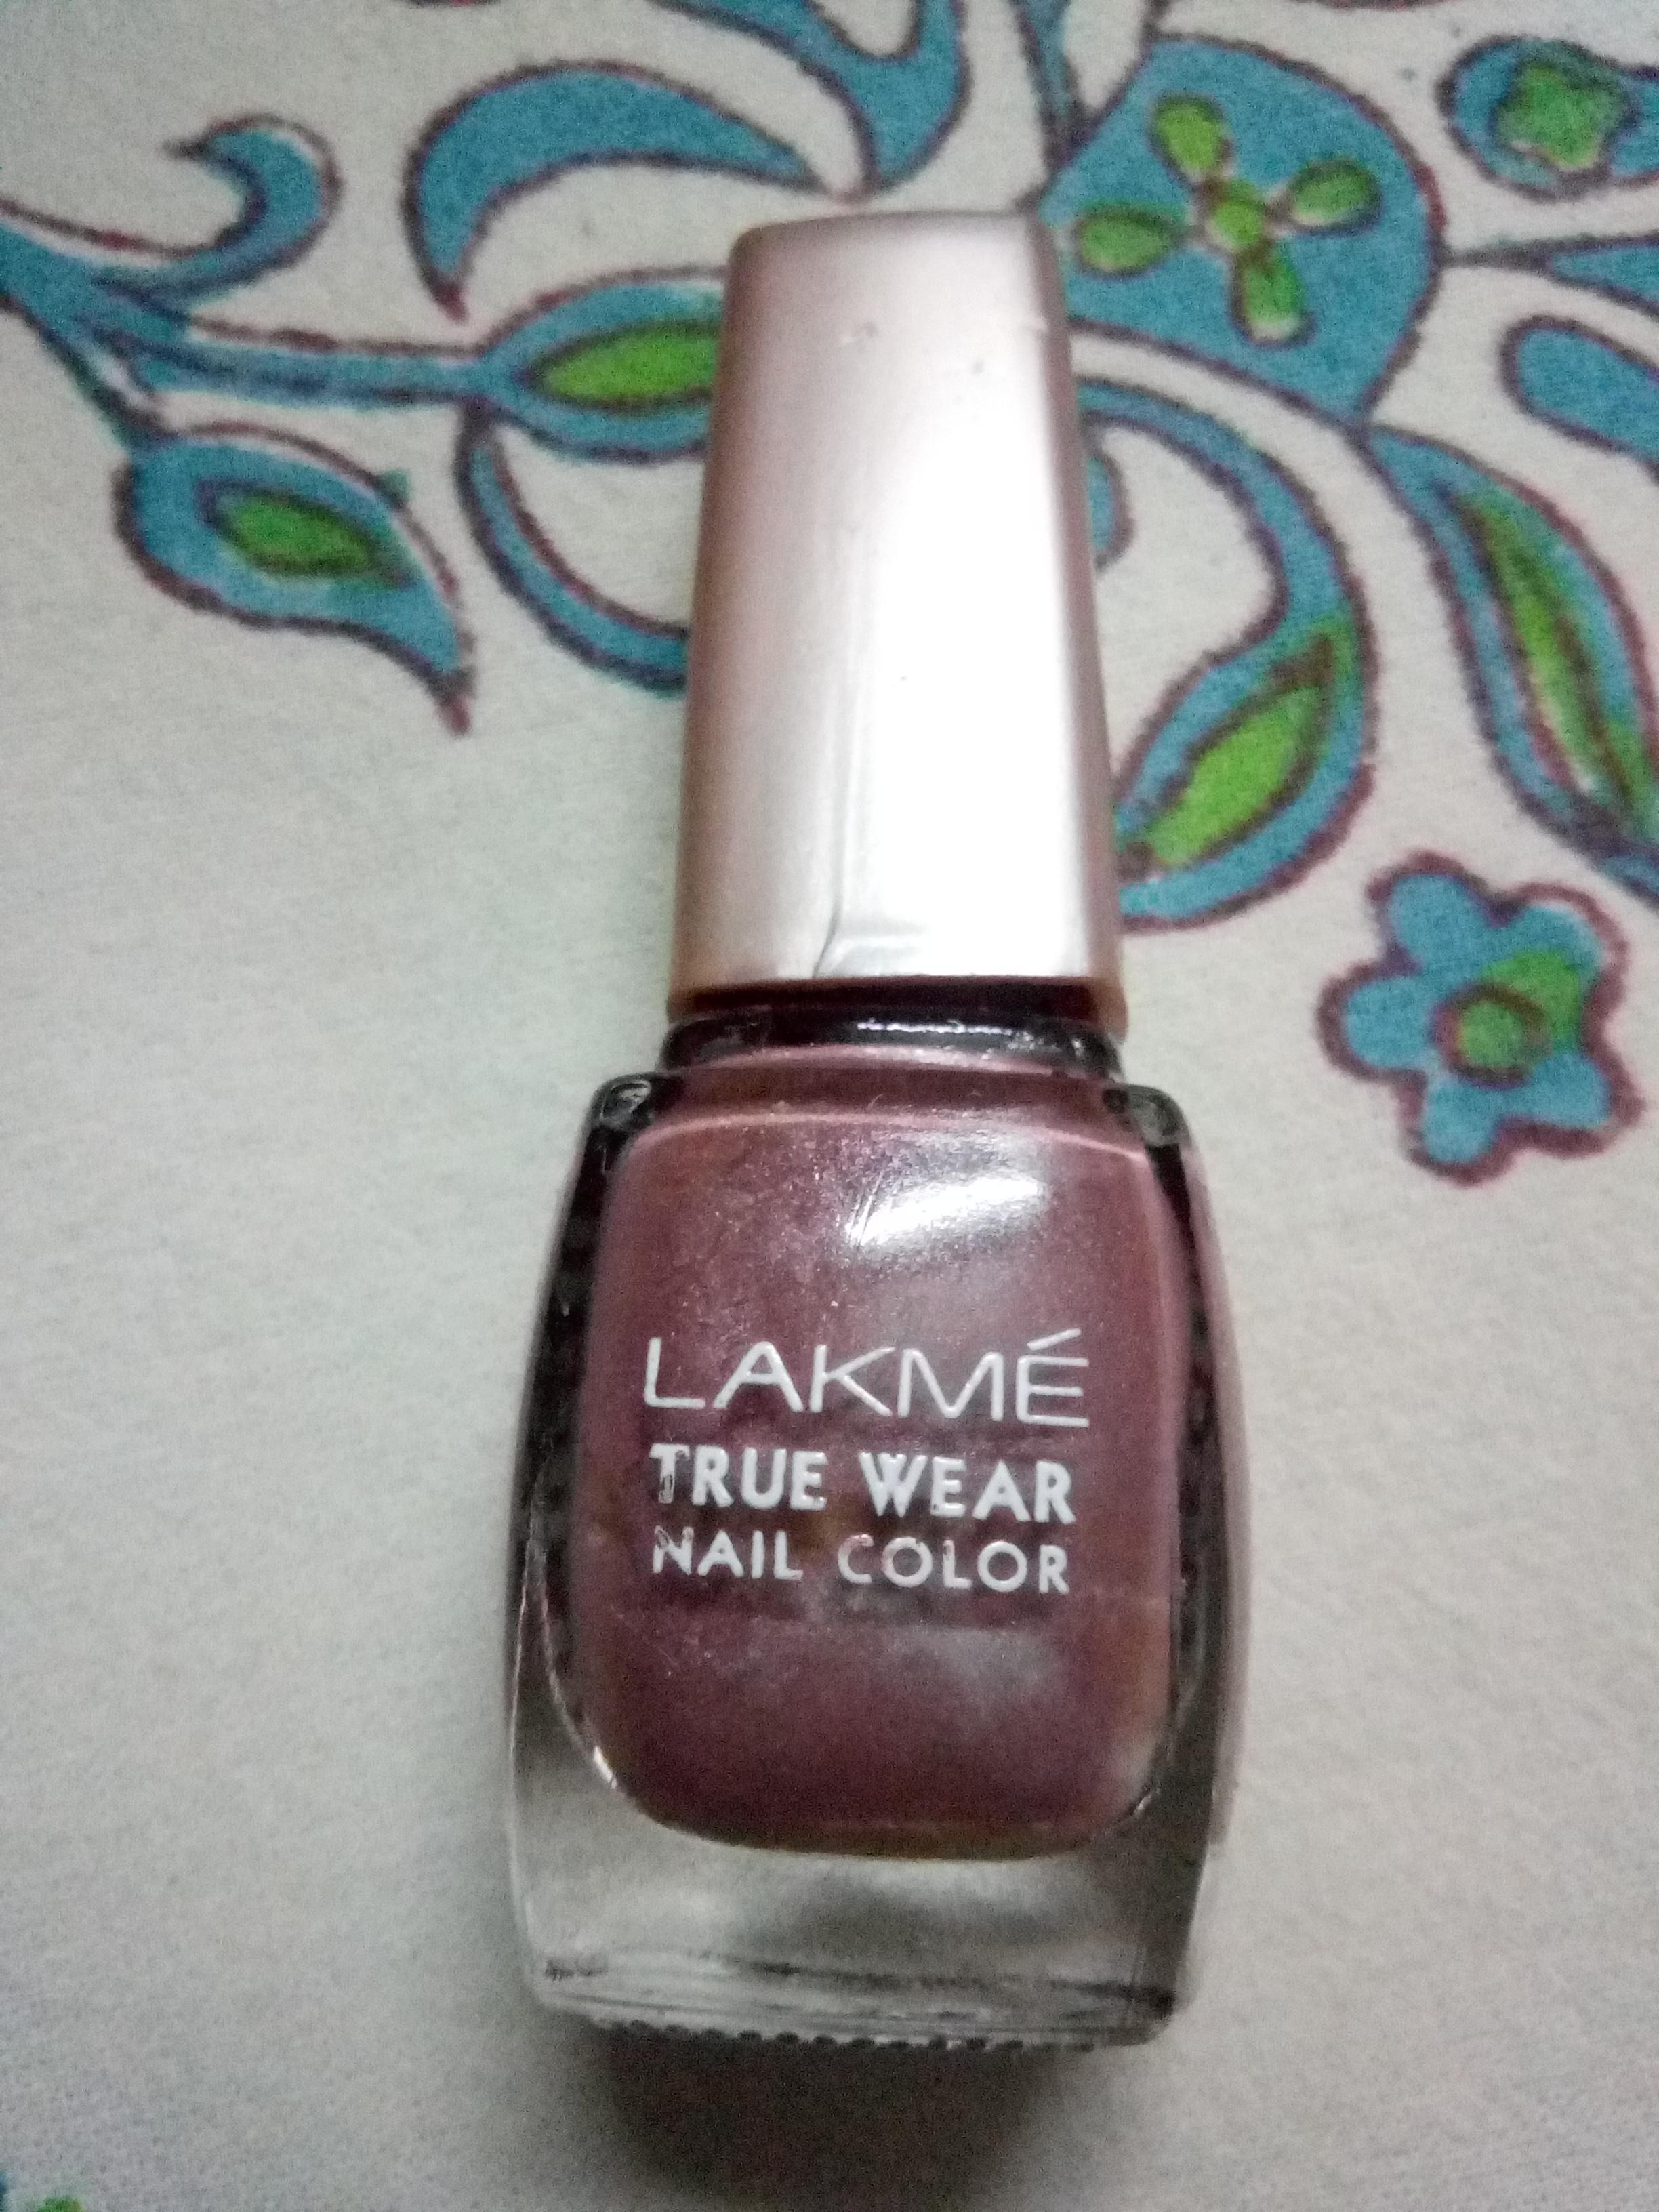 Lakme True Wear Color Crush-Lakme True Wear Color Crush-By aflyingsoul